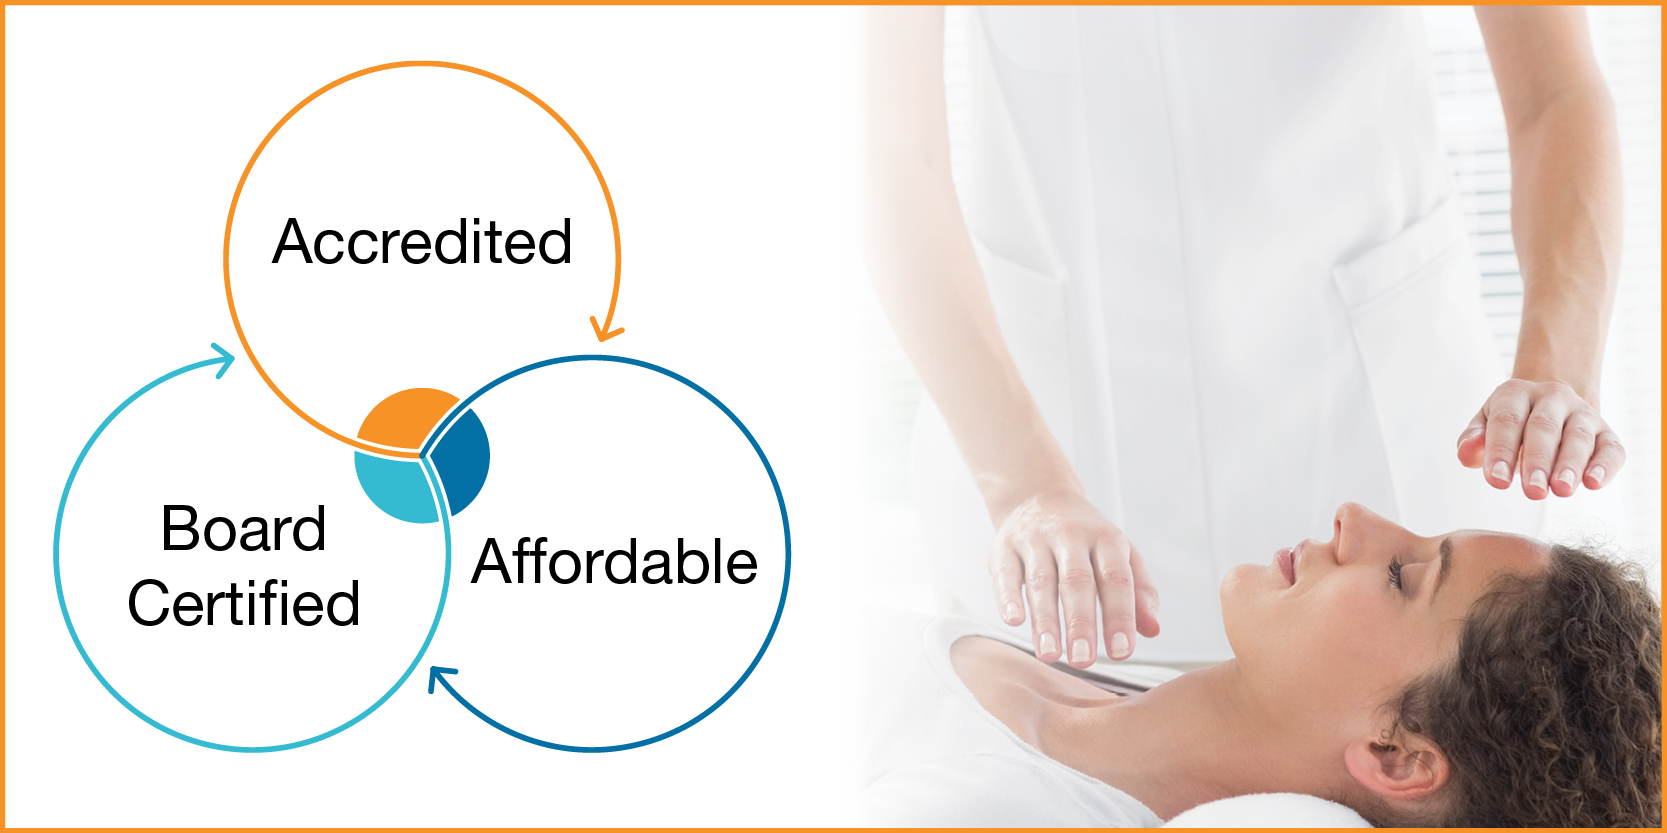 Healing Touch Program Home